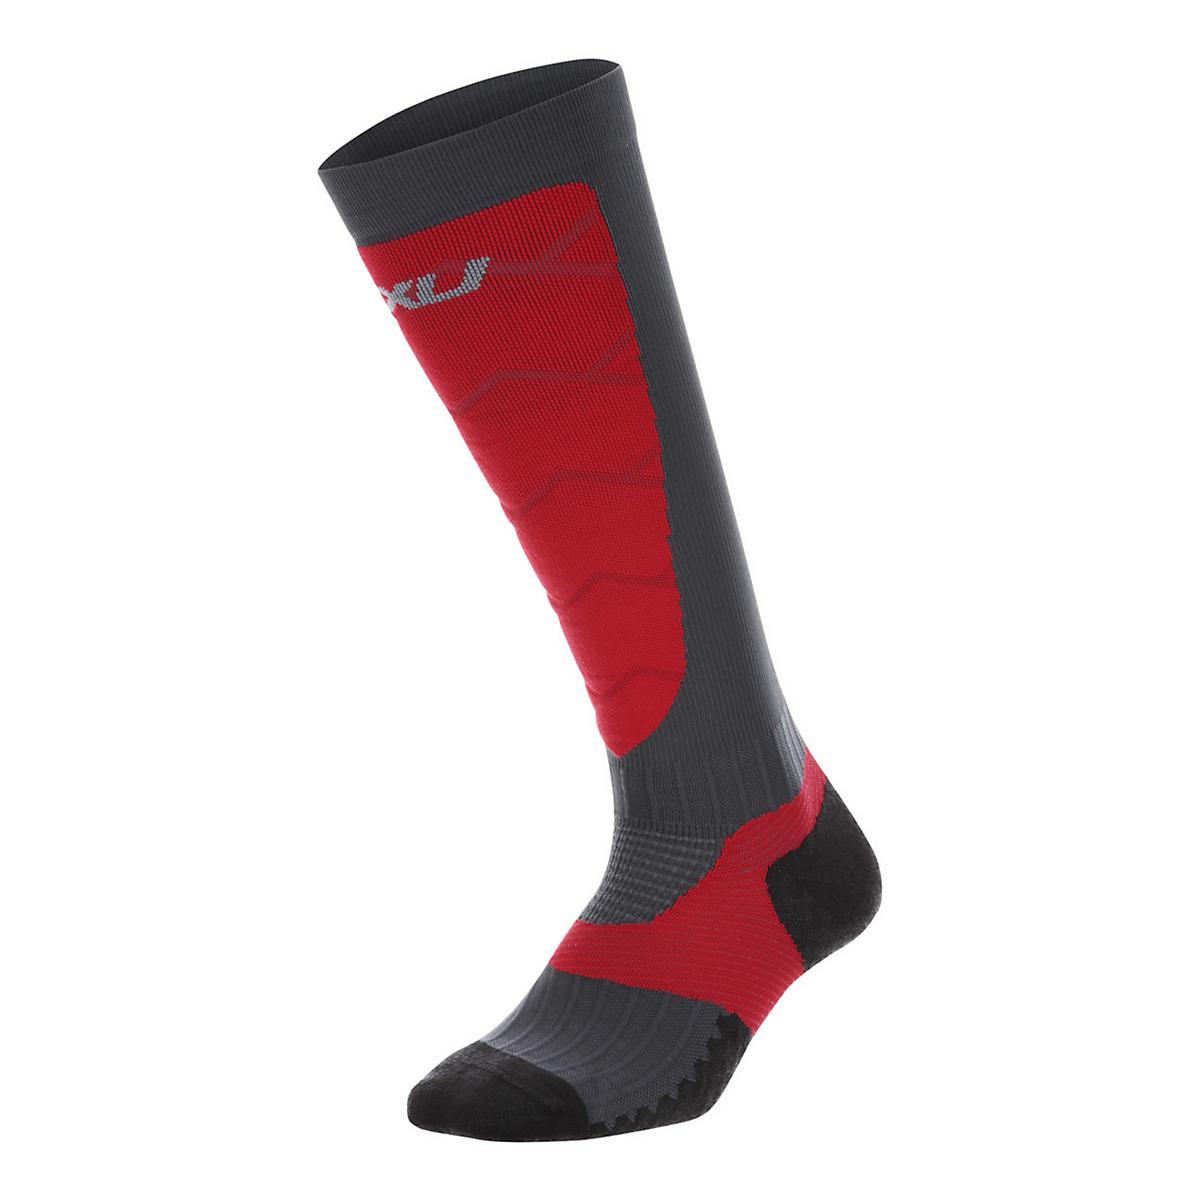 c4a0076b1d Mens 2XU Elite Compression Alpine Socks Injury Recovery at Road Runner  Sports